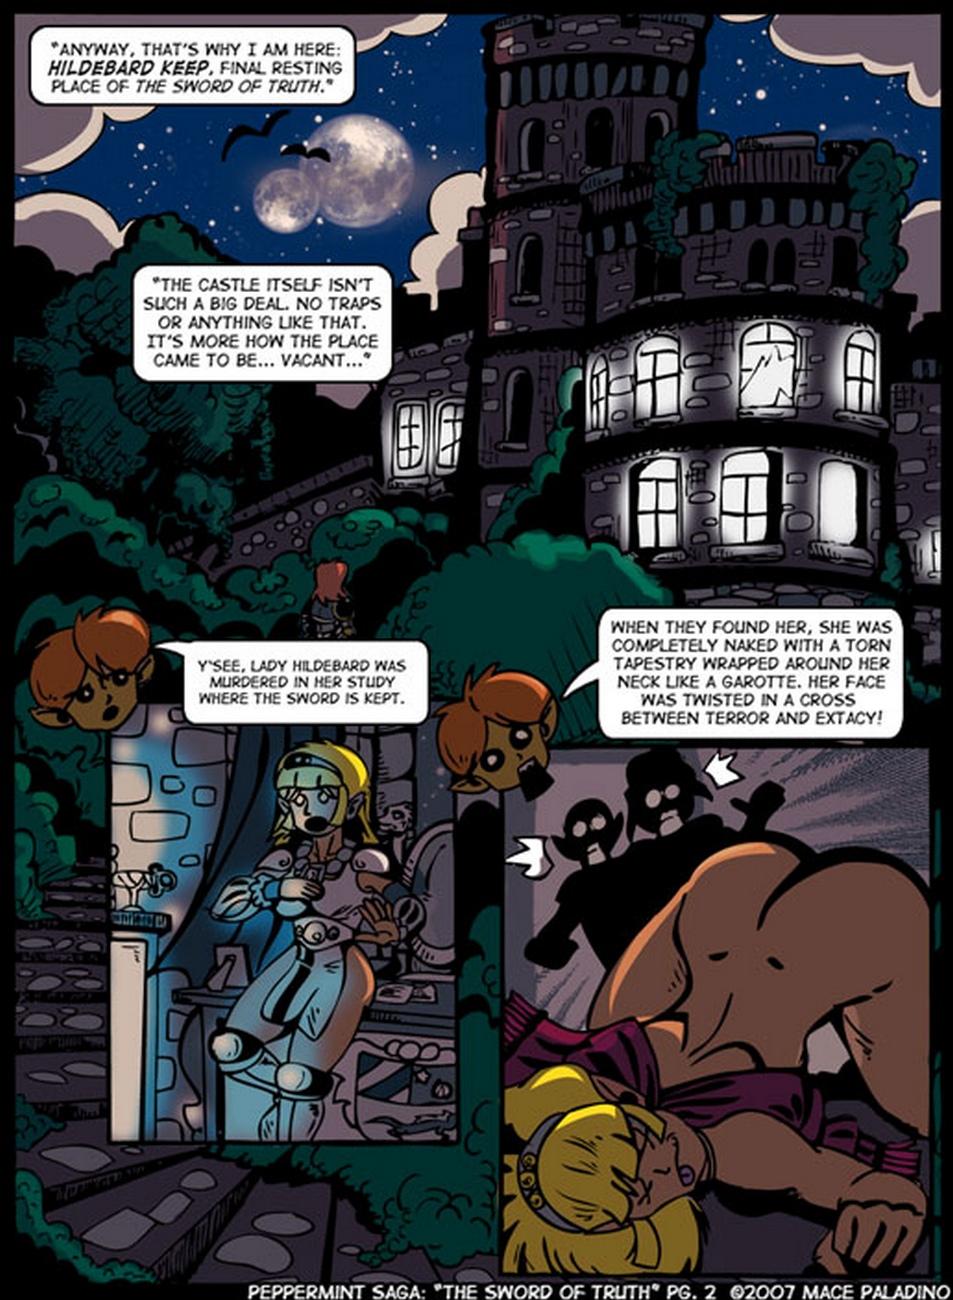 Peppermint-Saga-1-The-Sword-Of-Truth 4 free sex comic